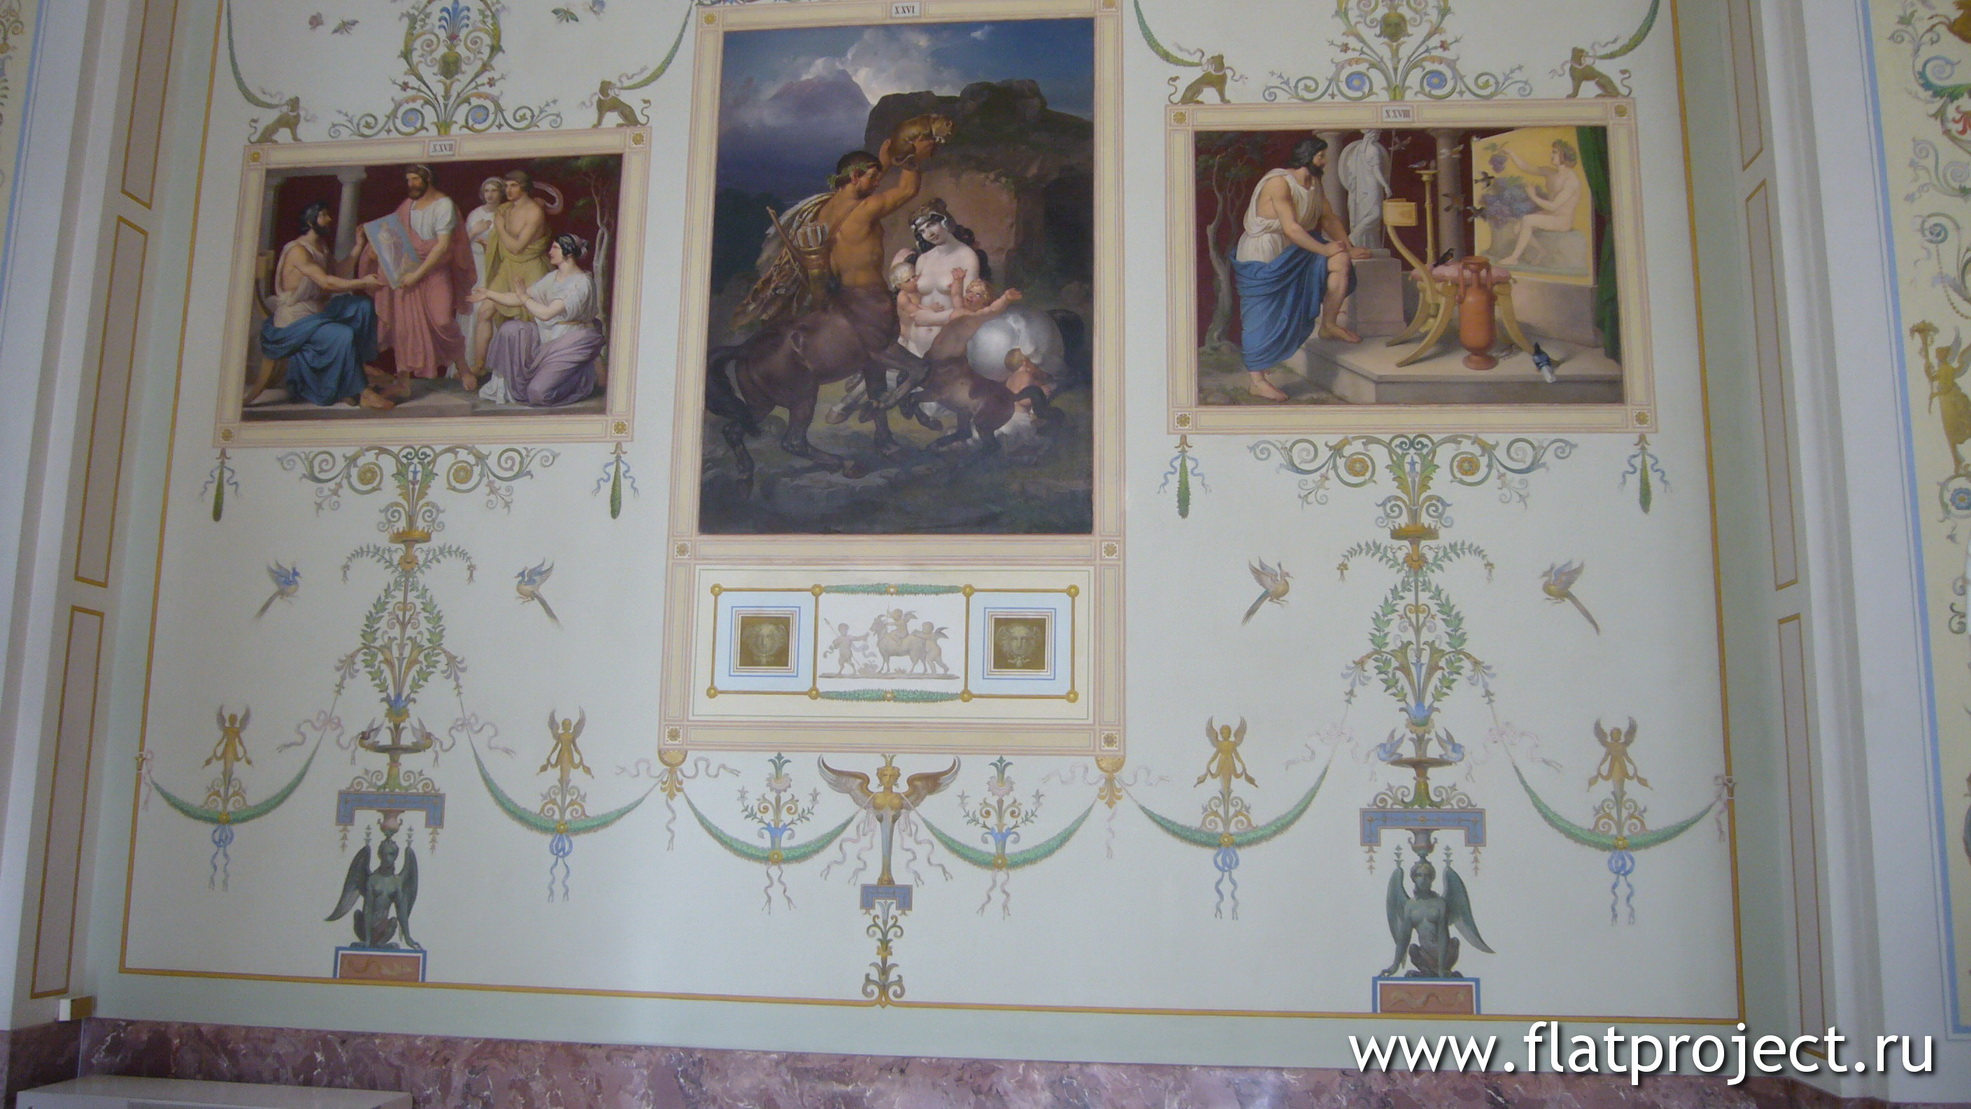 The State Hermitage museum interiors – photo 237